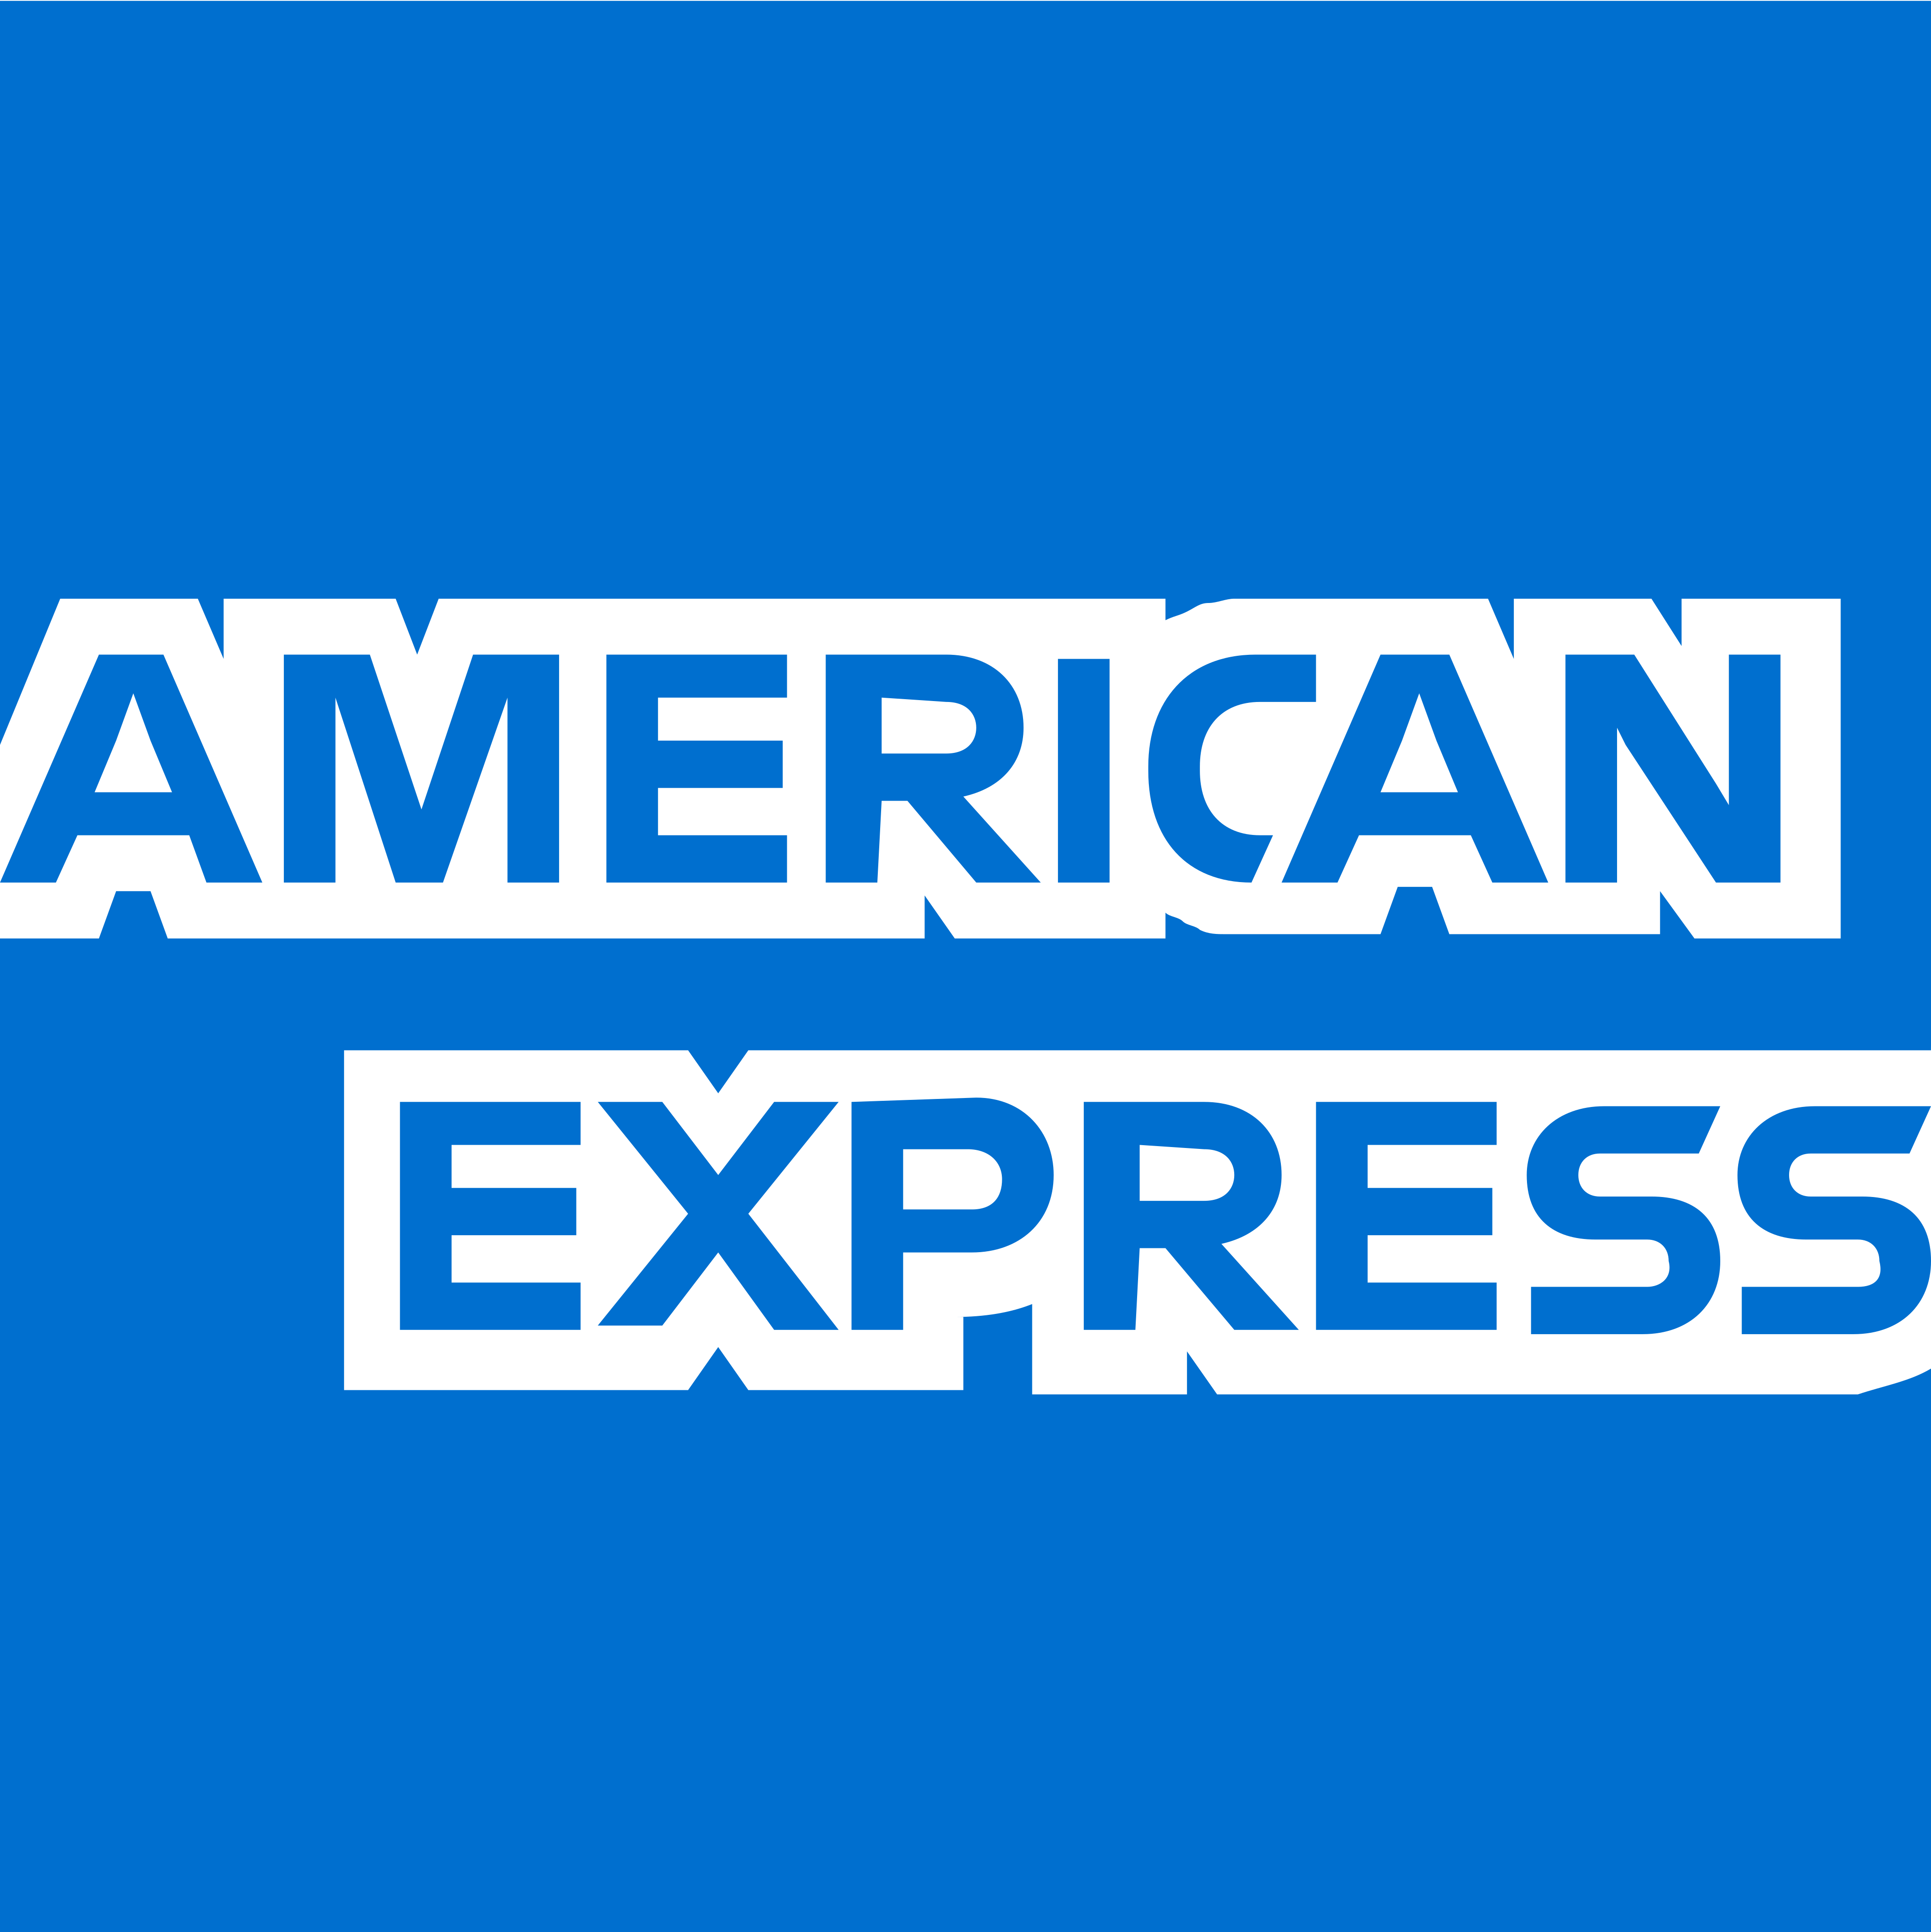 amex american express logo - American Express Logo